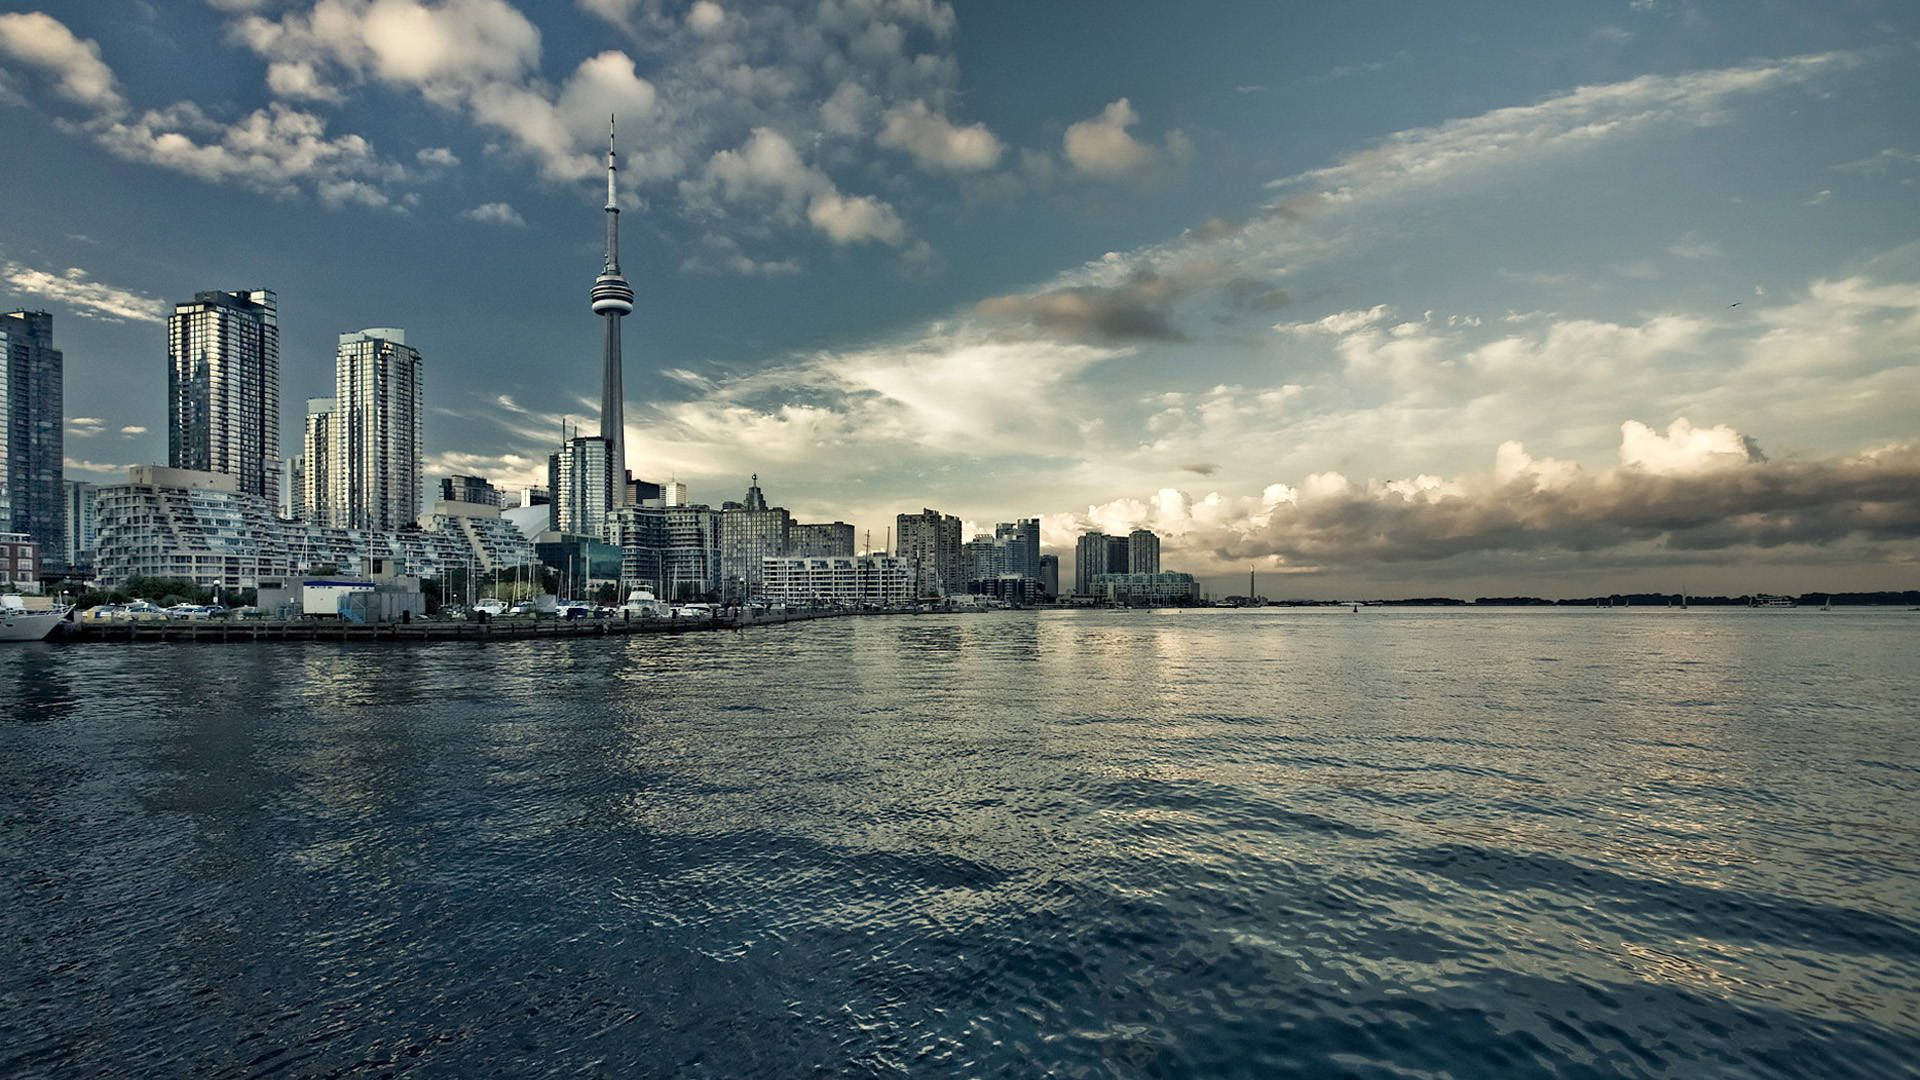 Toronto free image